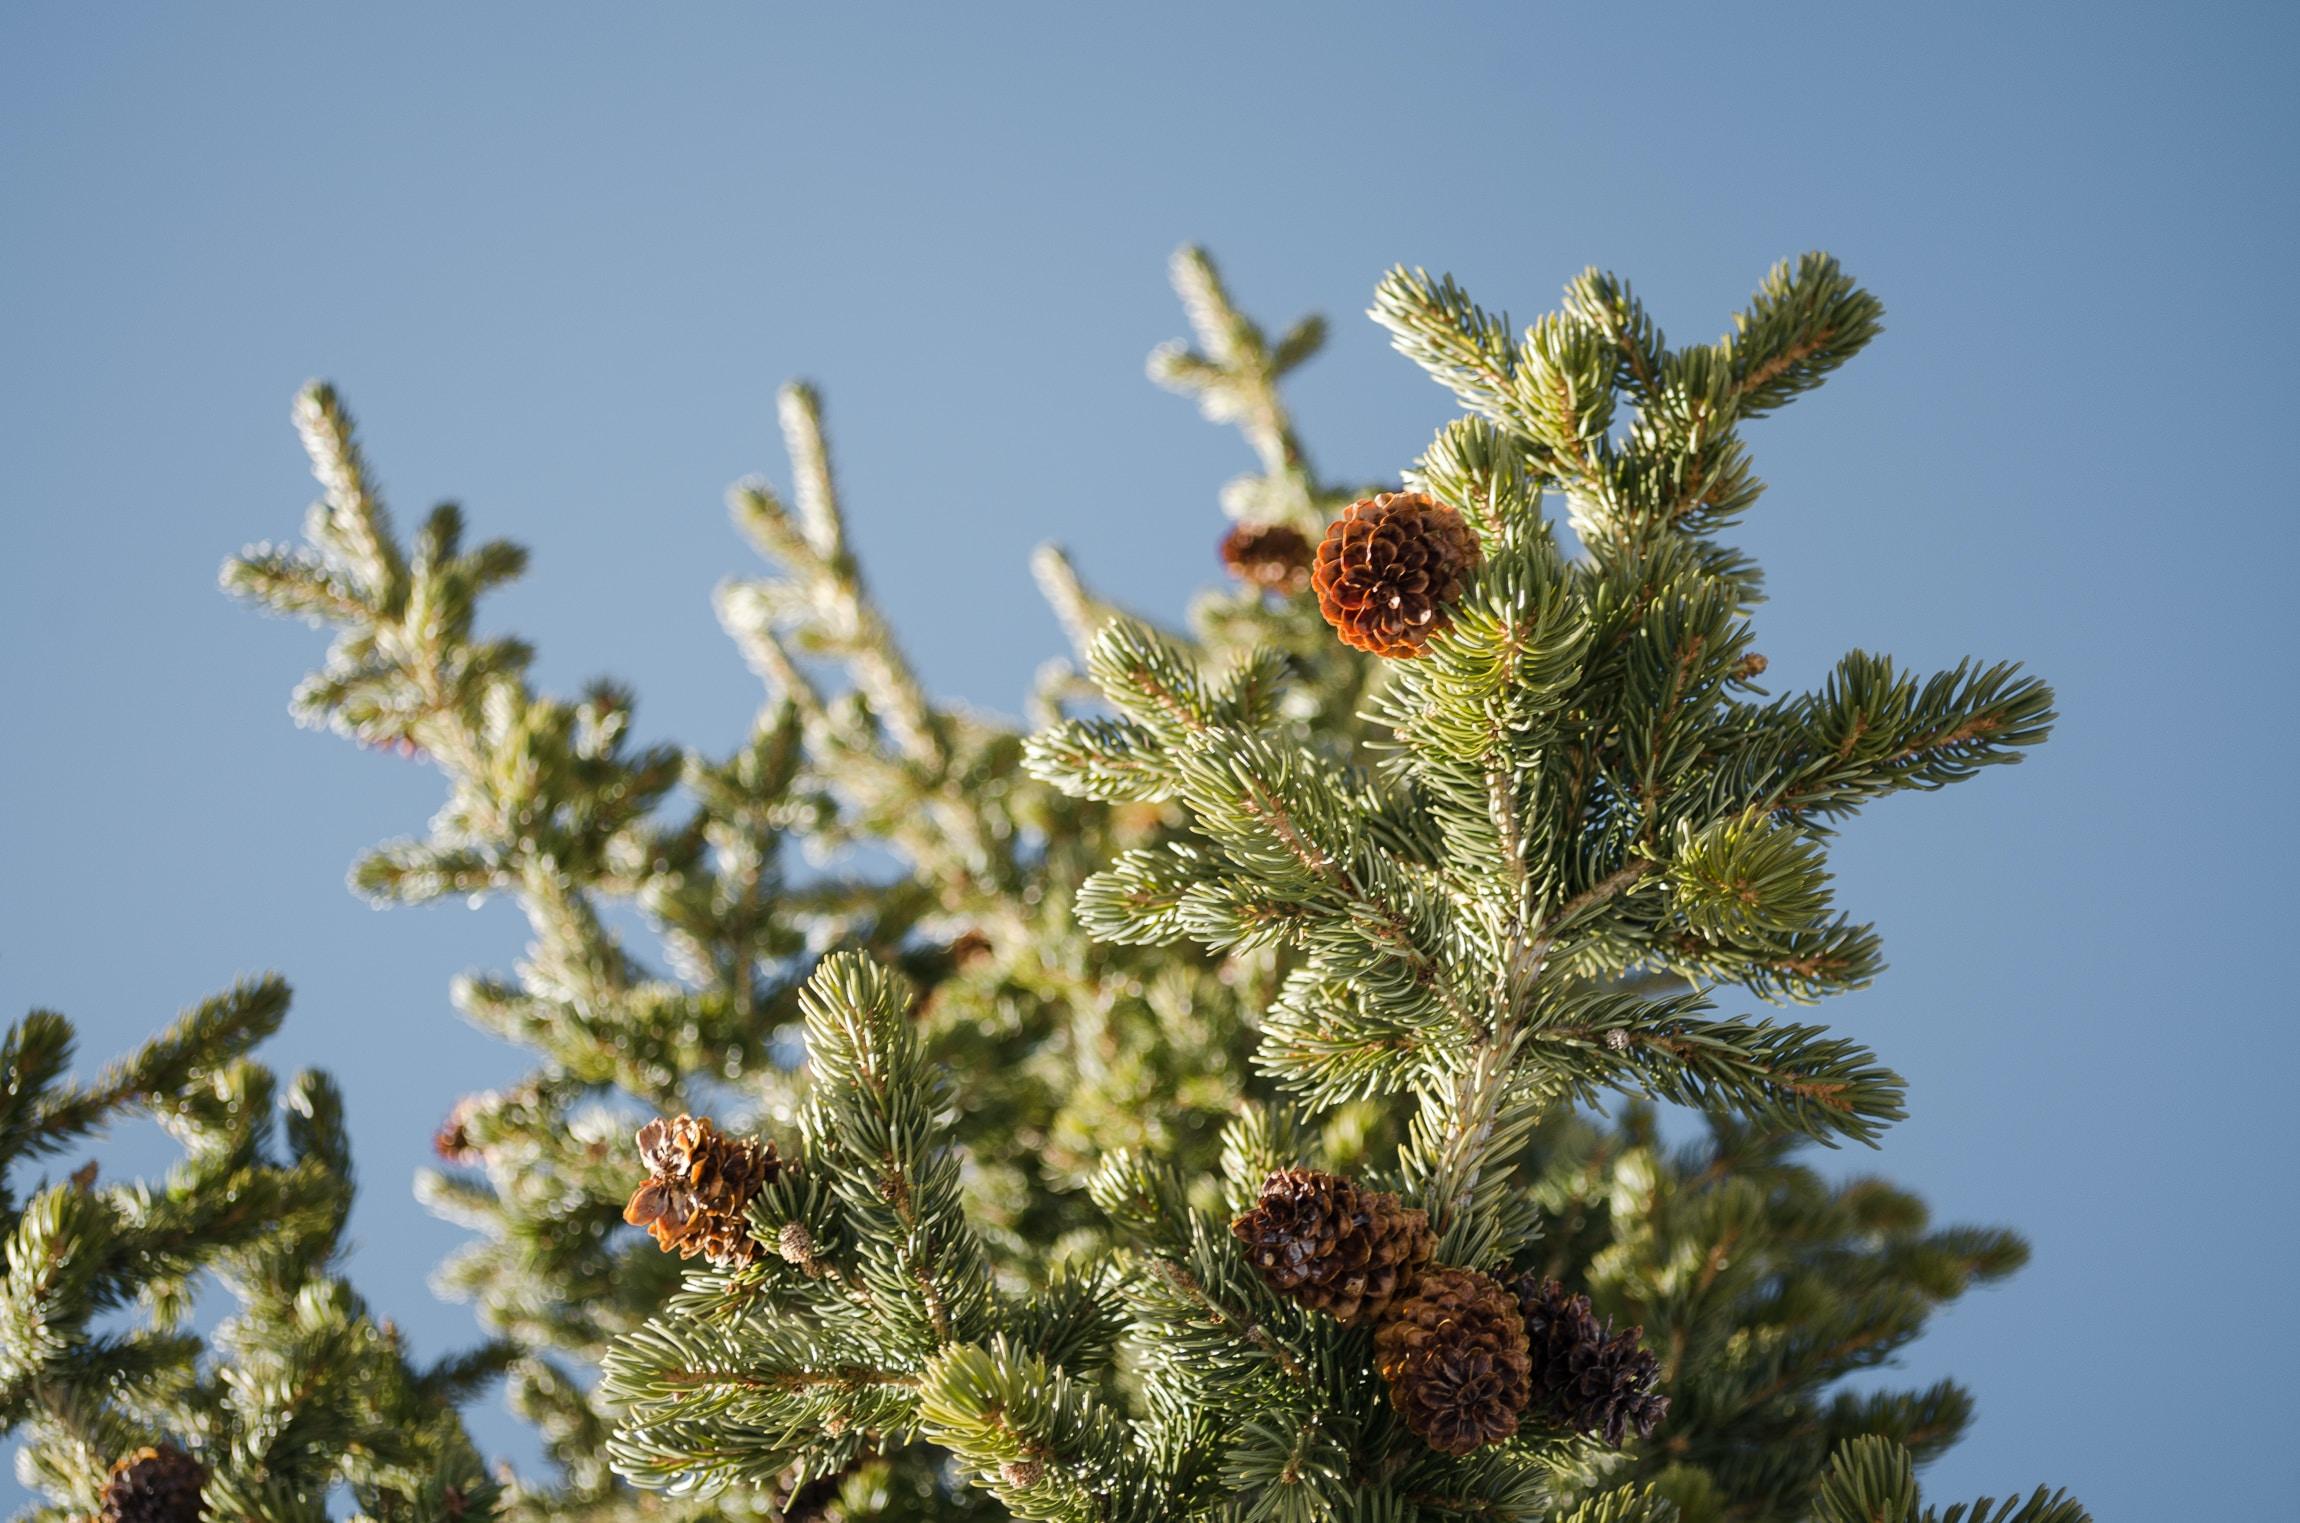 closeup photo of brown petaled flowers